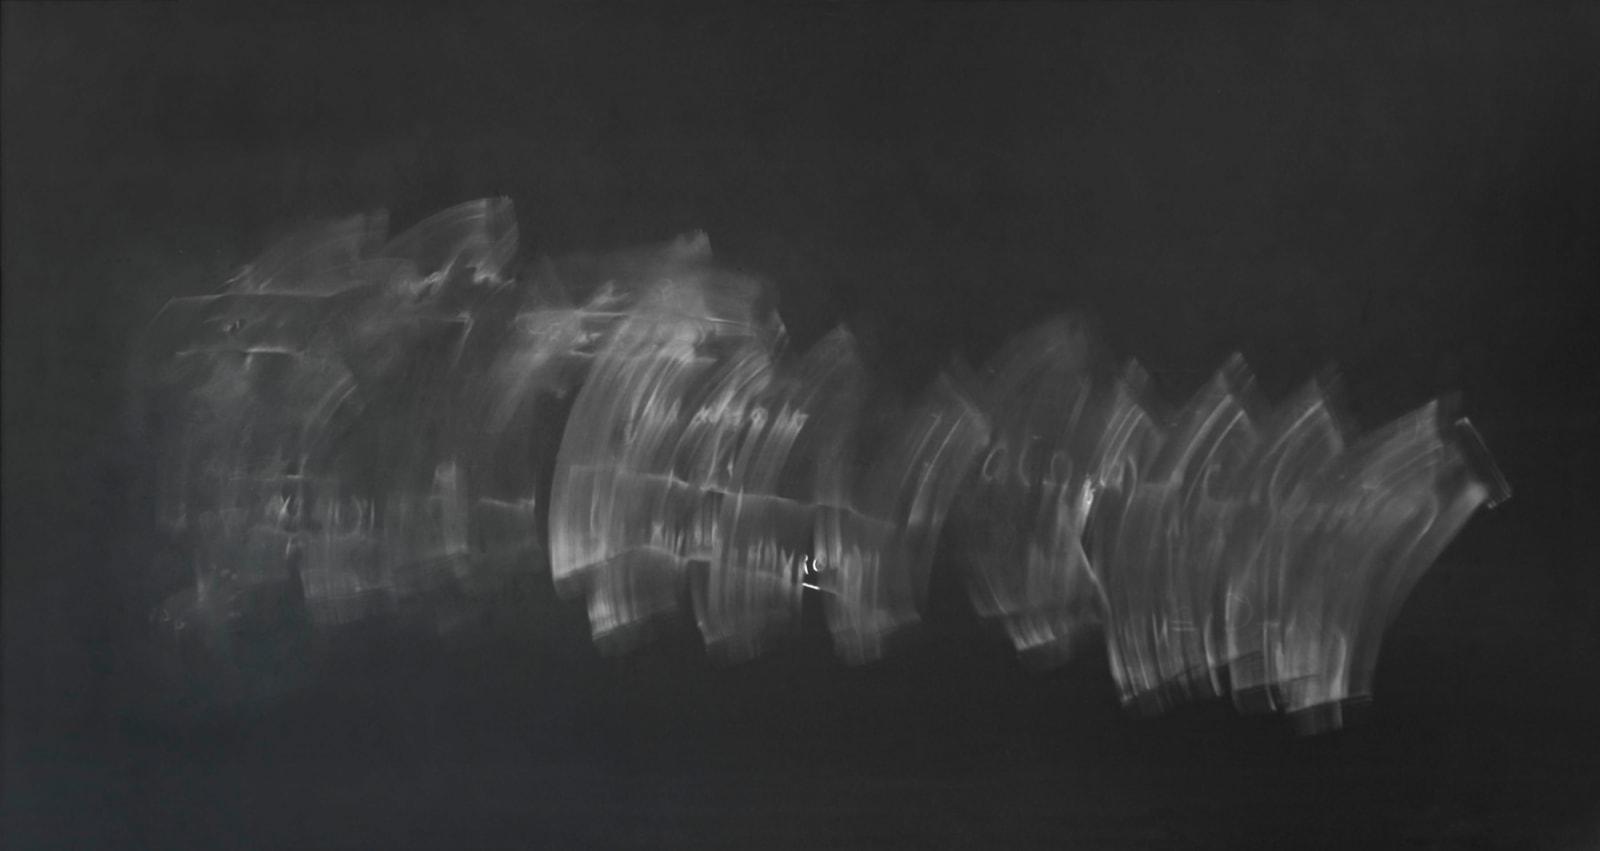 Jessica Wynne Mitchell Faulk #1 Columbia University erased chalkboard with mathematical writing